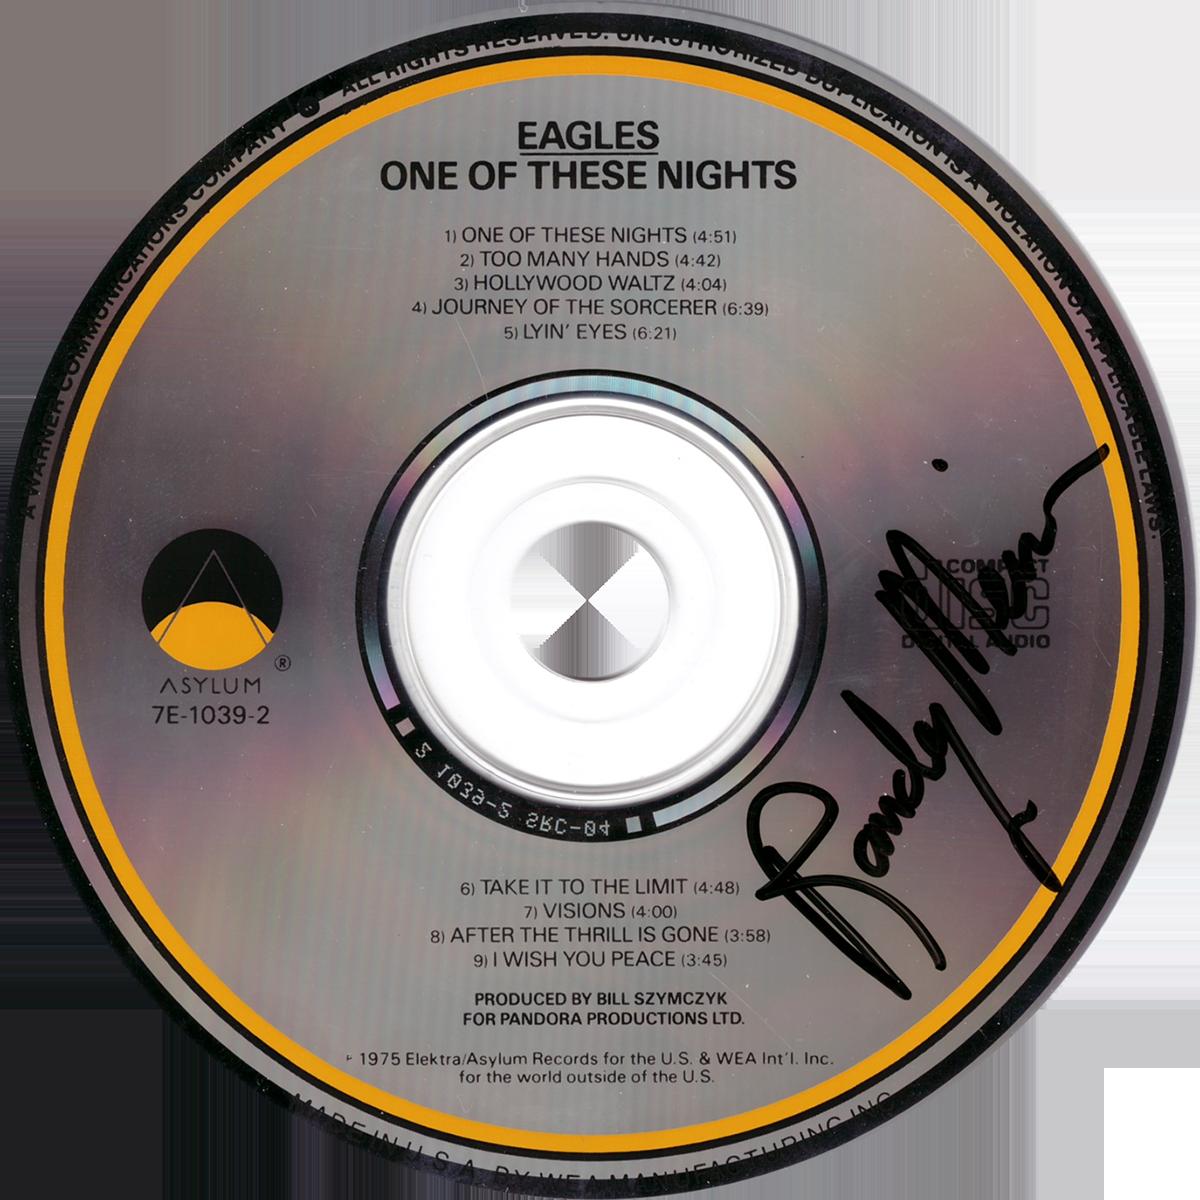 Randy Meisner CD - One of These Nights #2